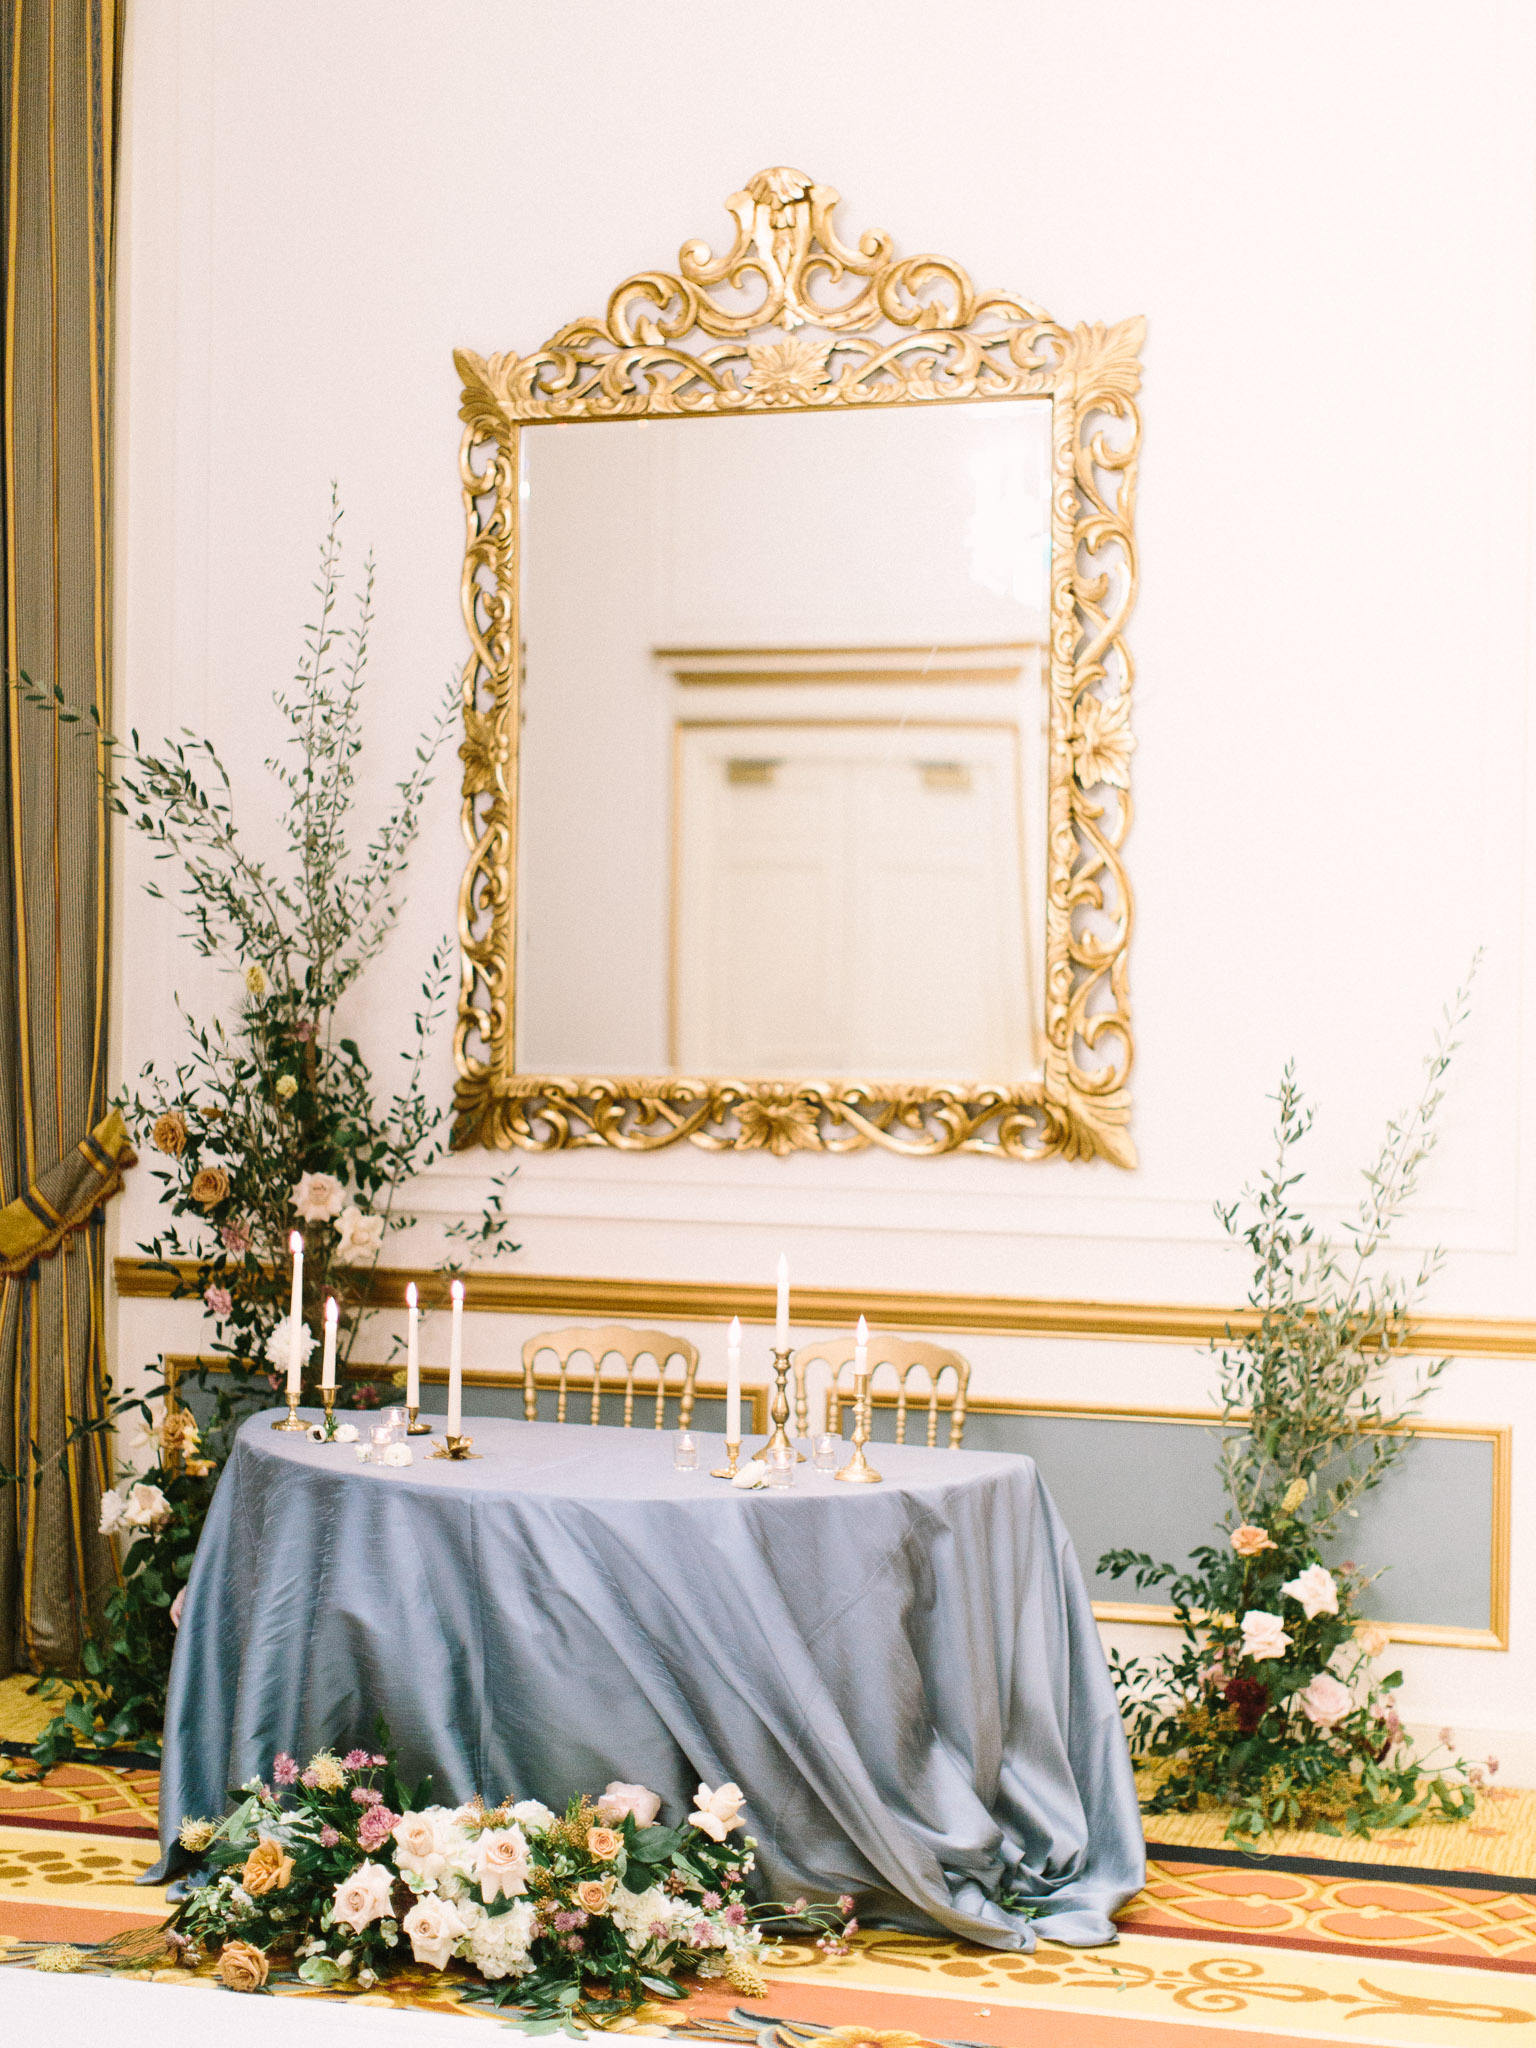 Hanna&Jordan Wedding_HotelVancouver_9546.jpg